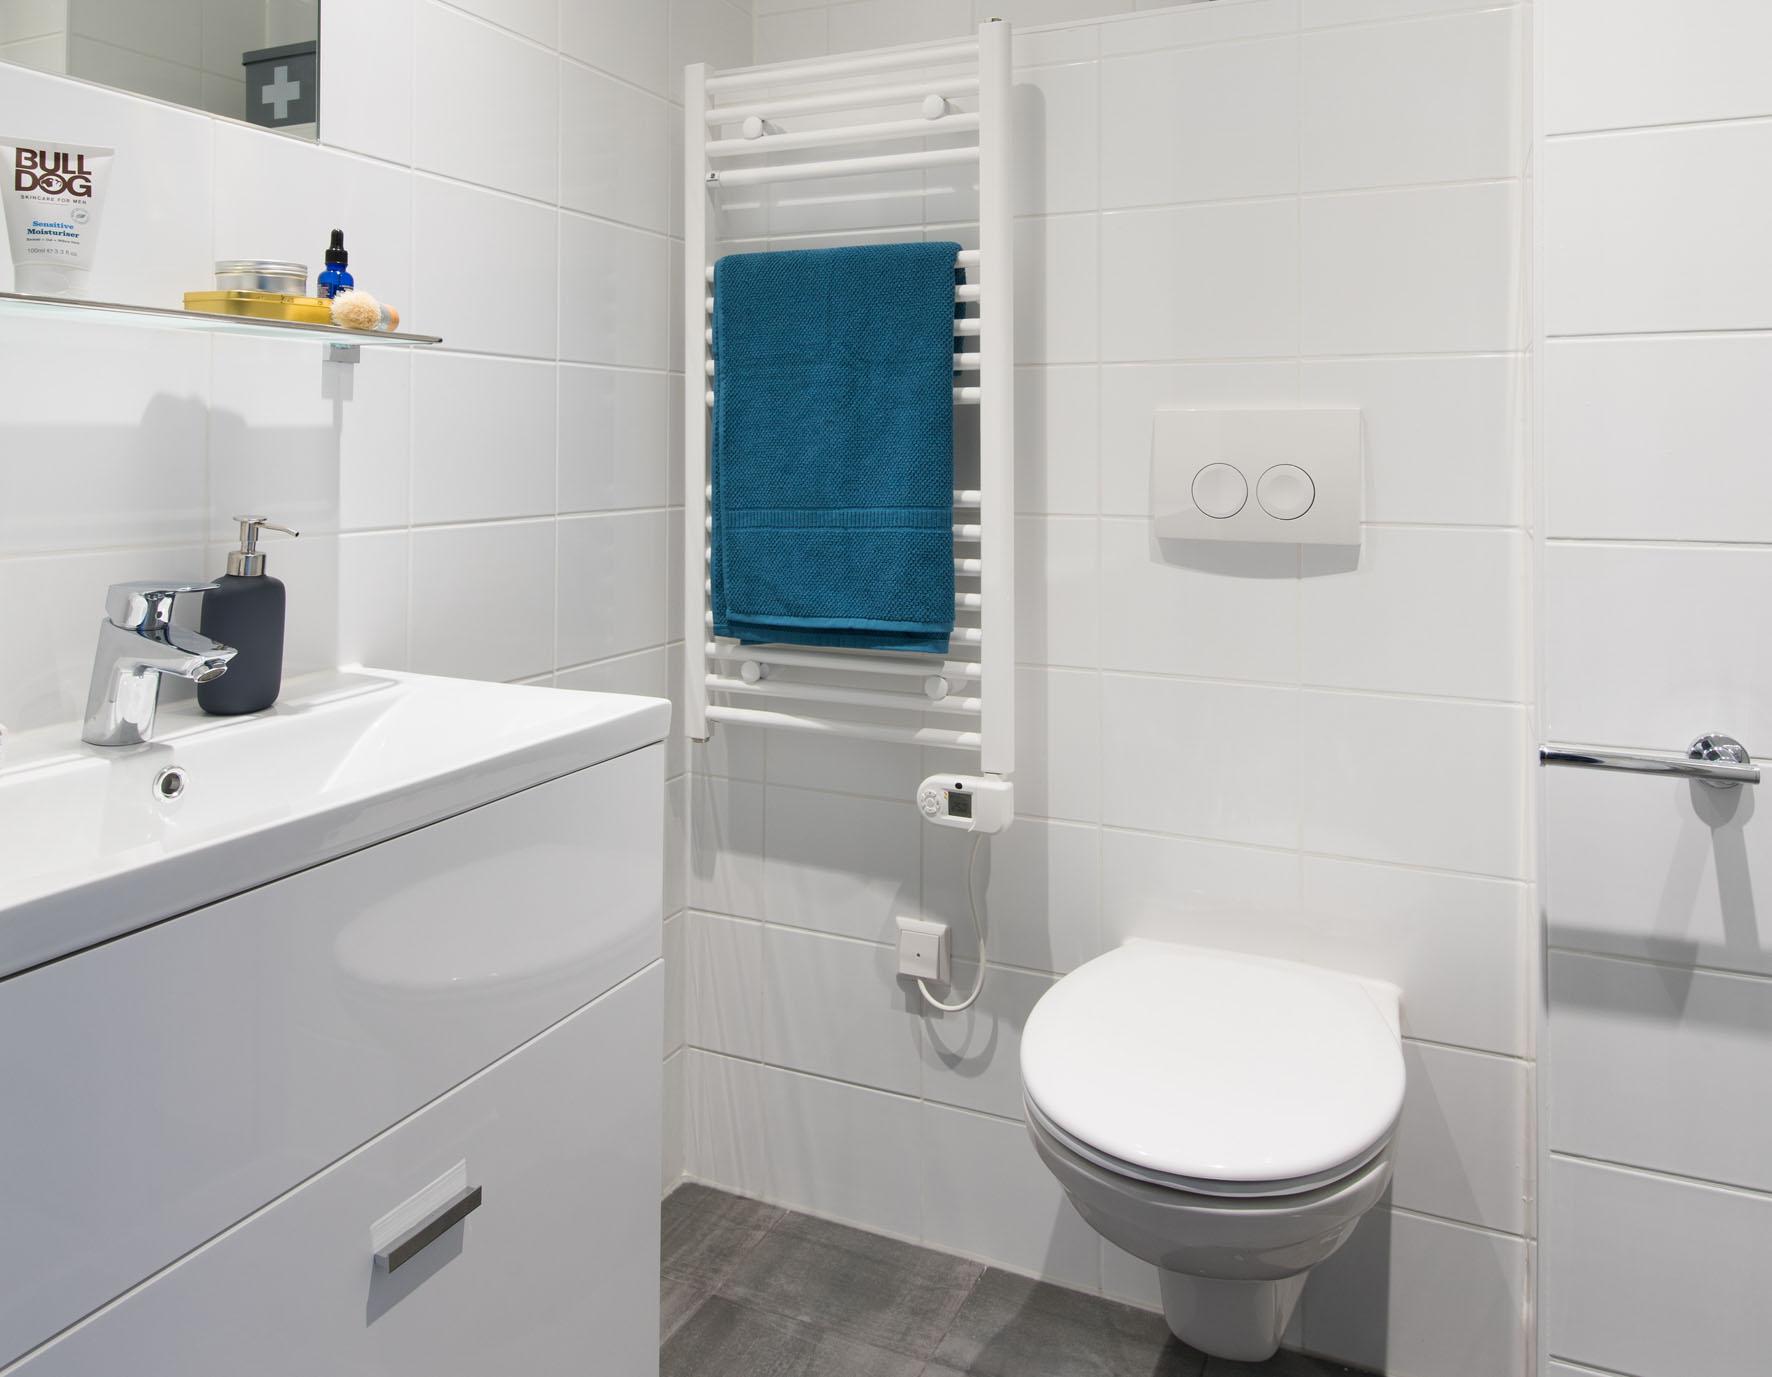 1-bedroom unfurnished apartment in OurDomain Amsterdam Diemen -bathroom